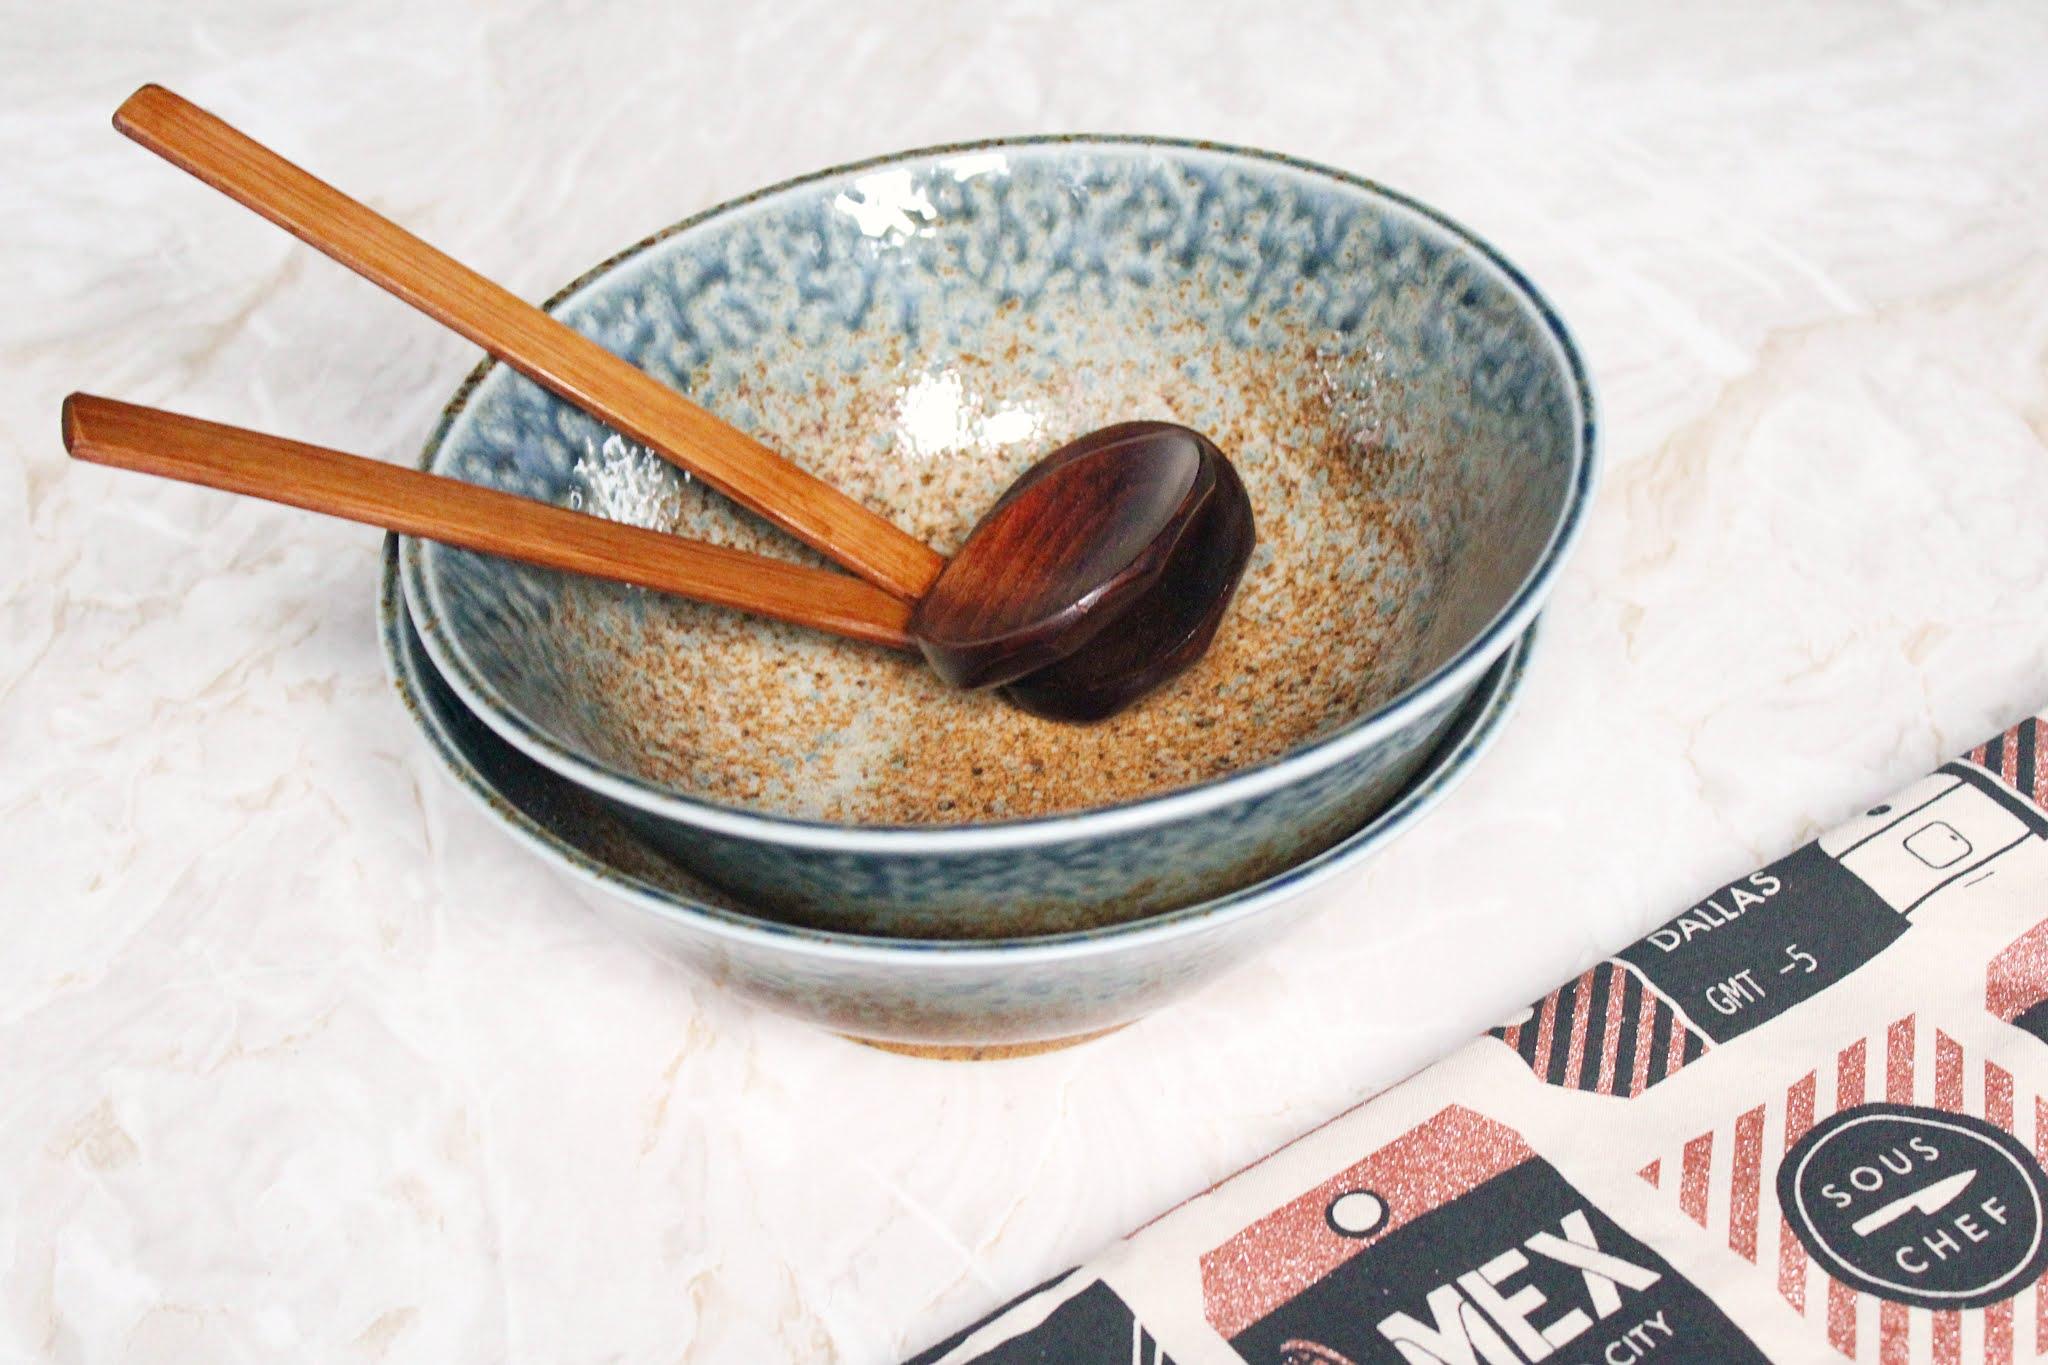 Sous Chef Chouseki Ramen Bowl Set | Christmas Gift Idea